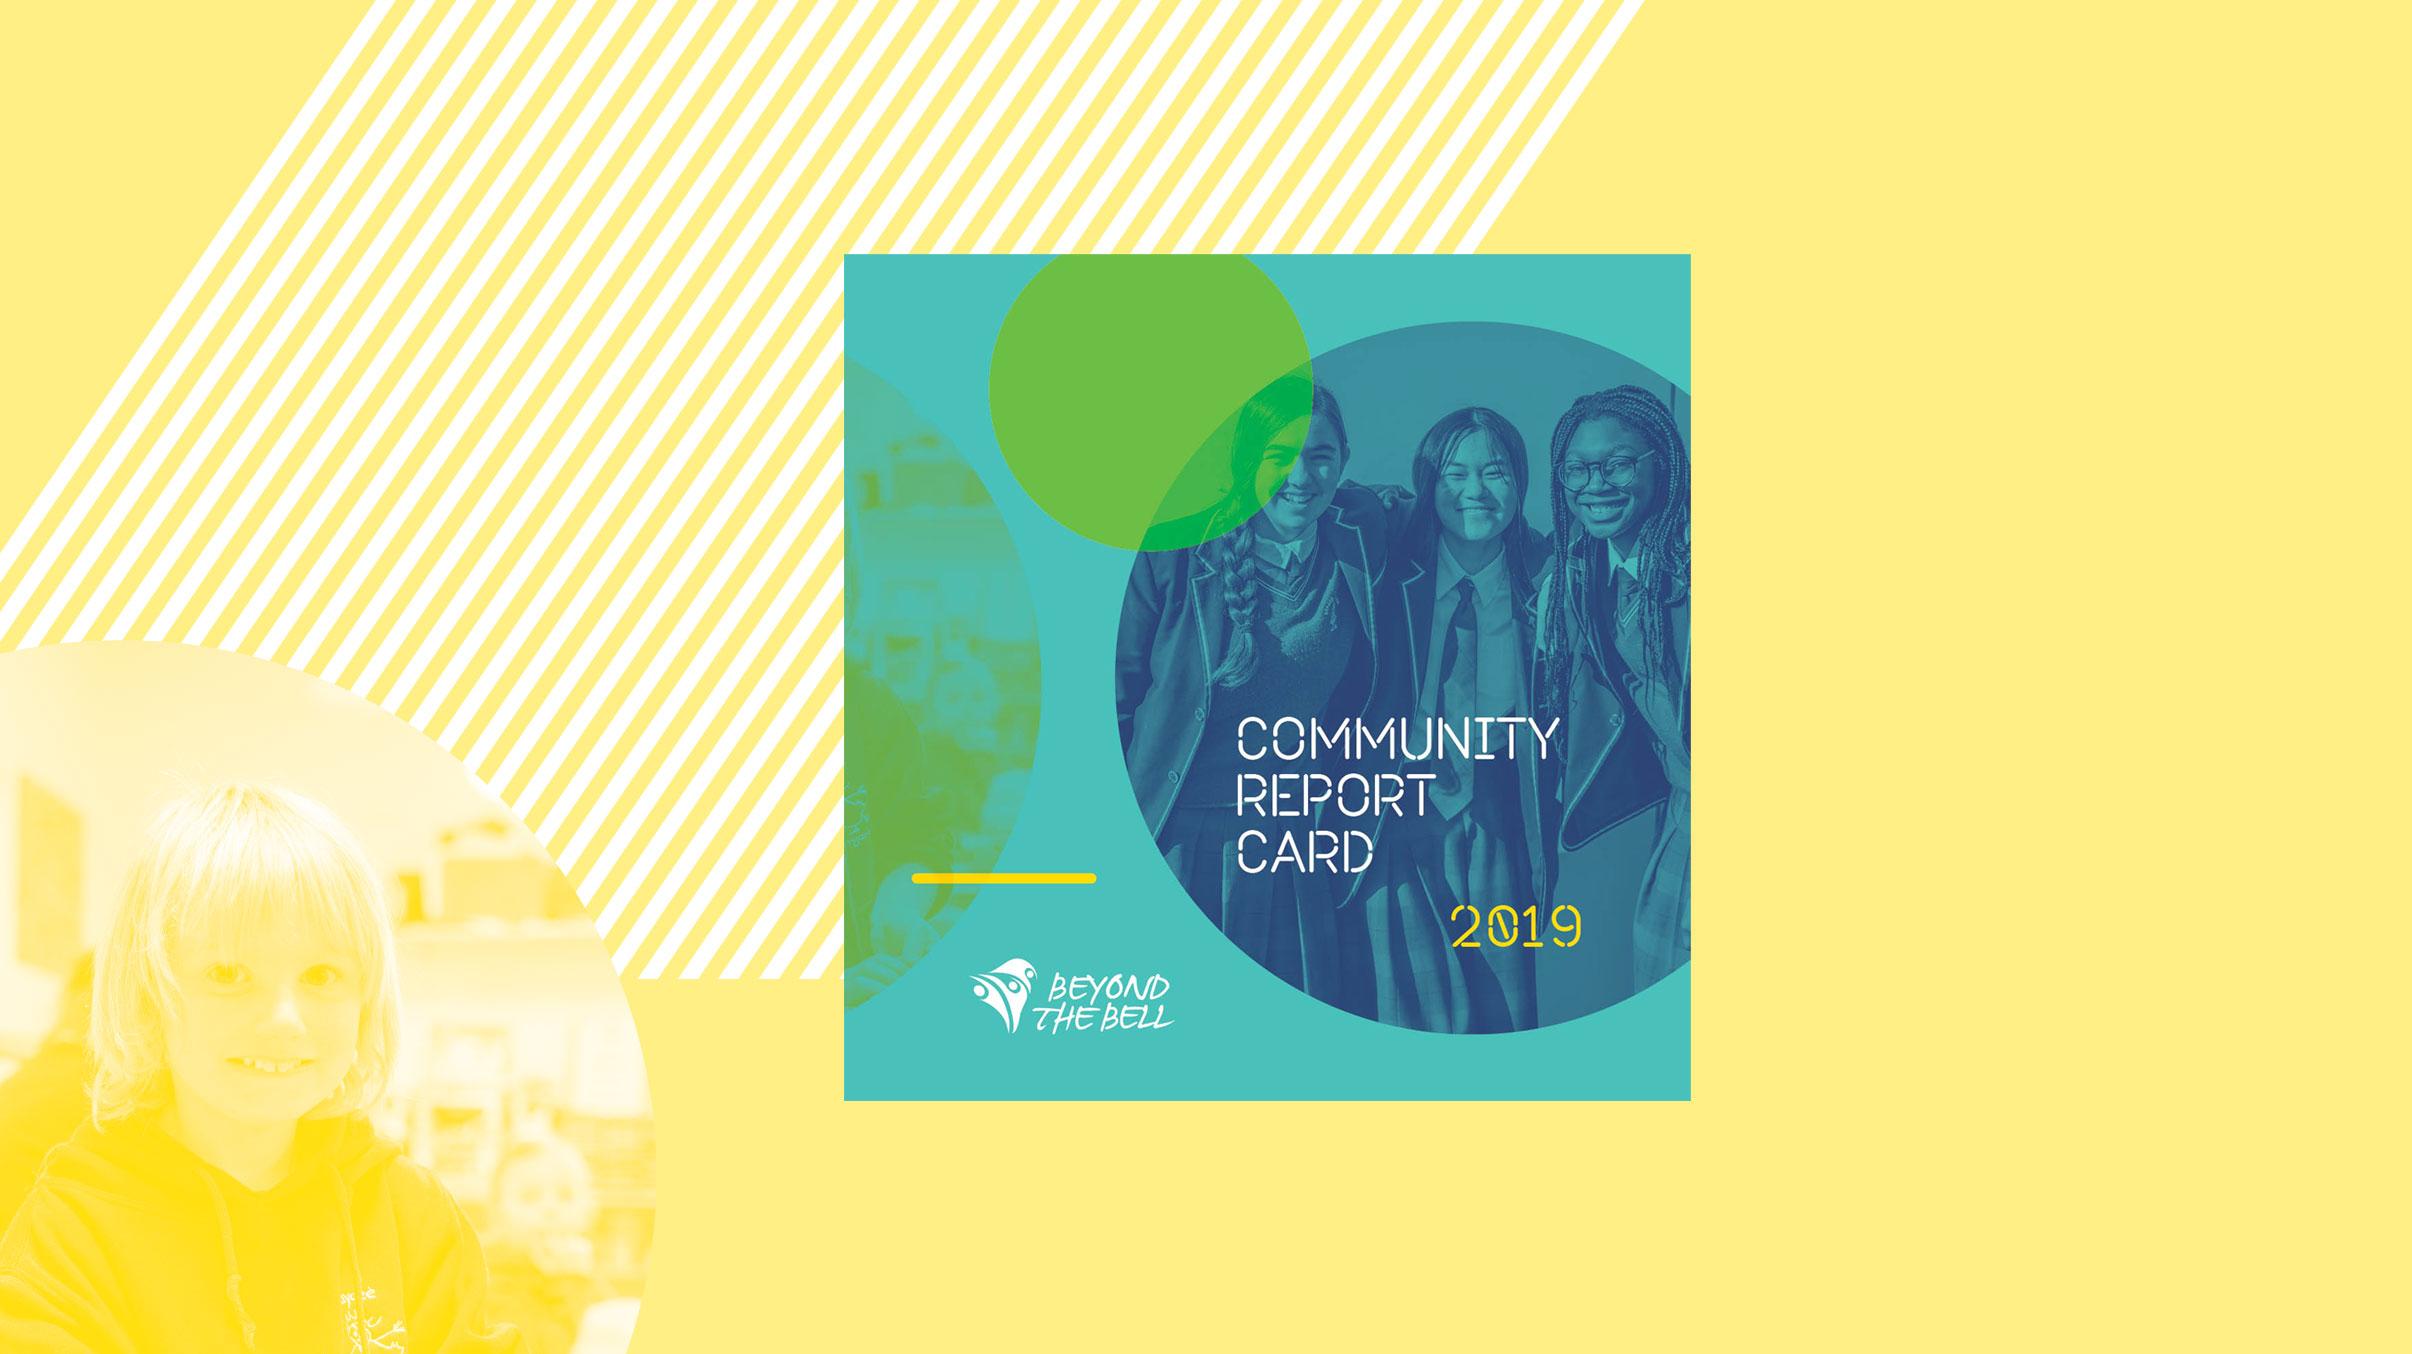 2019 Community Report Card